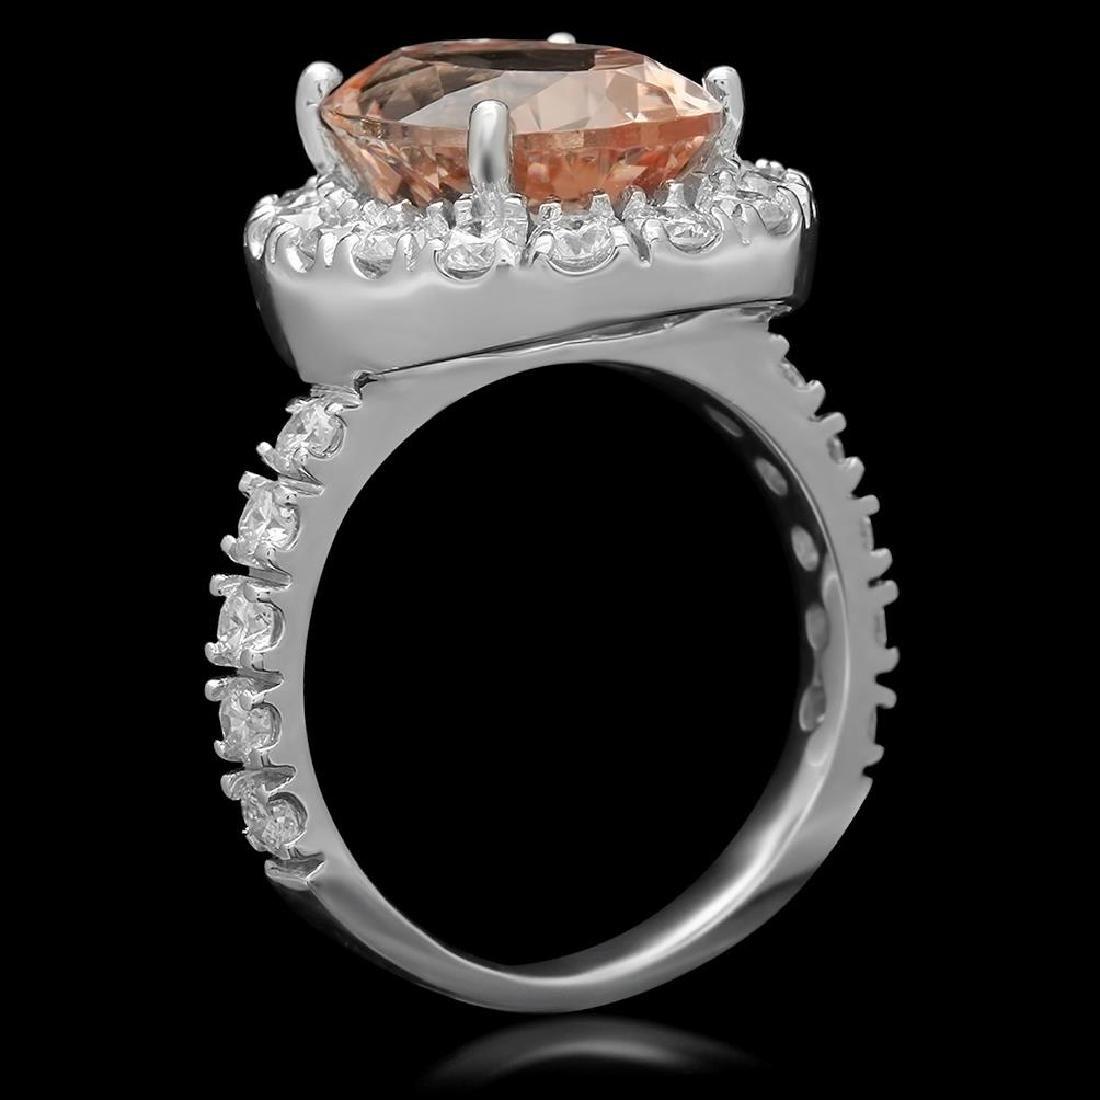 14K Gold 5.84ct Morganite 1.81ct Diamond Ring - 2